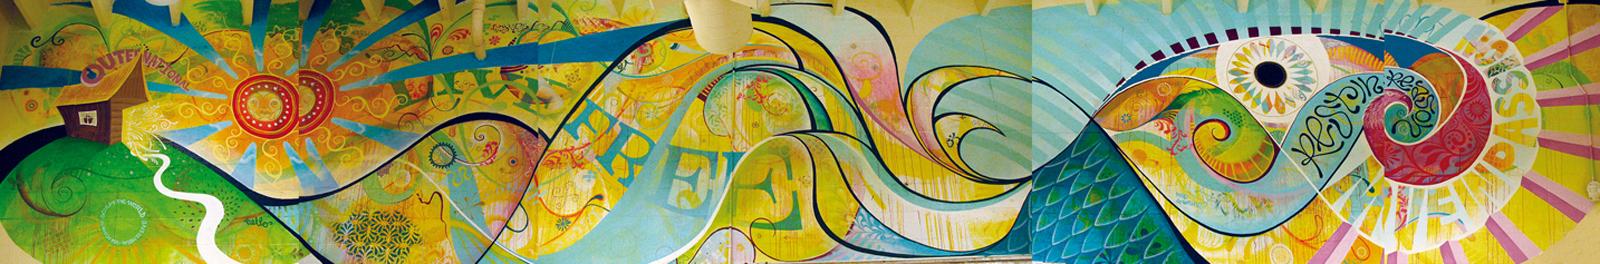 murals_create3.jpg